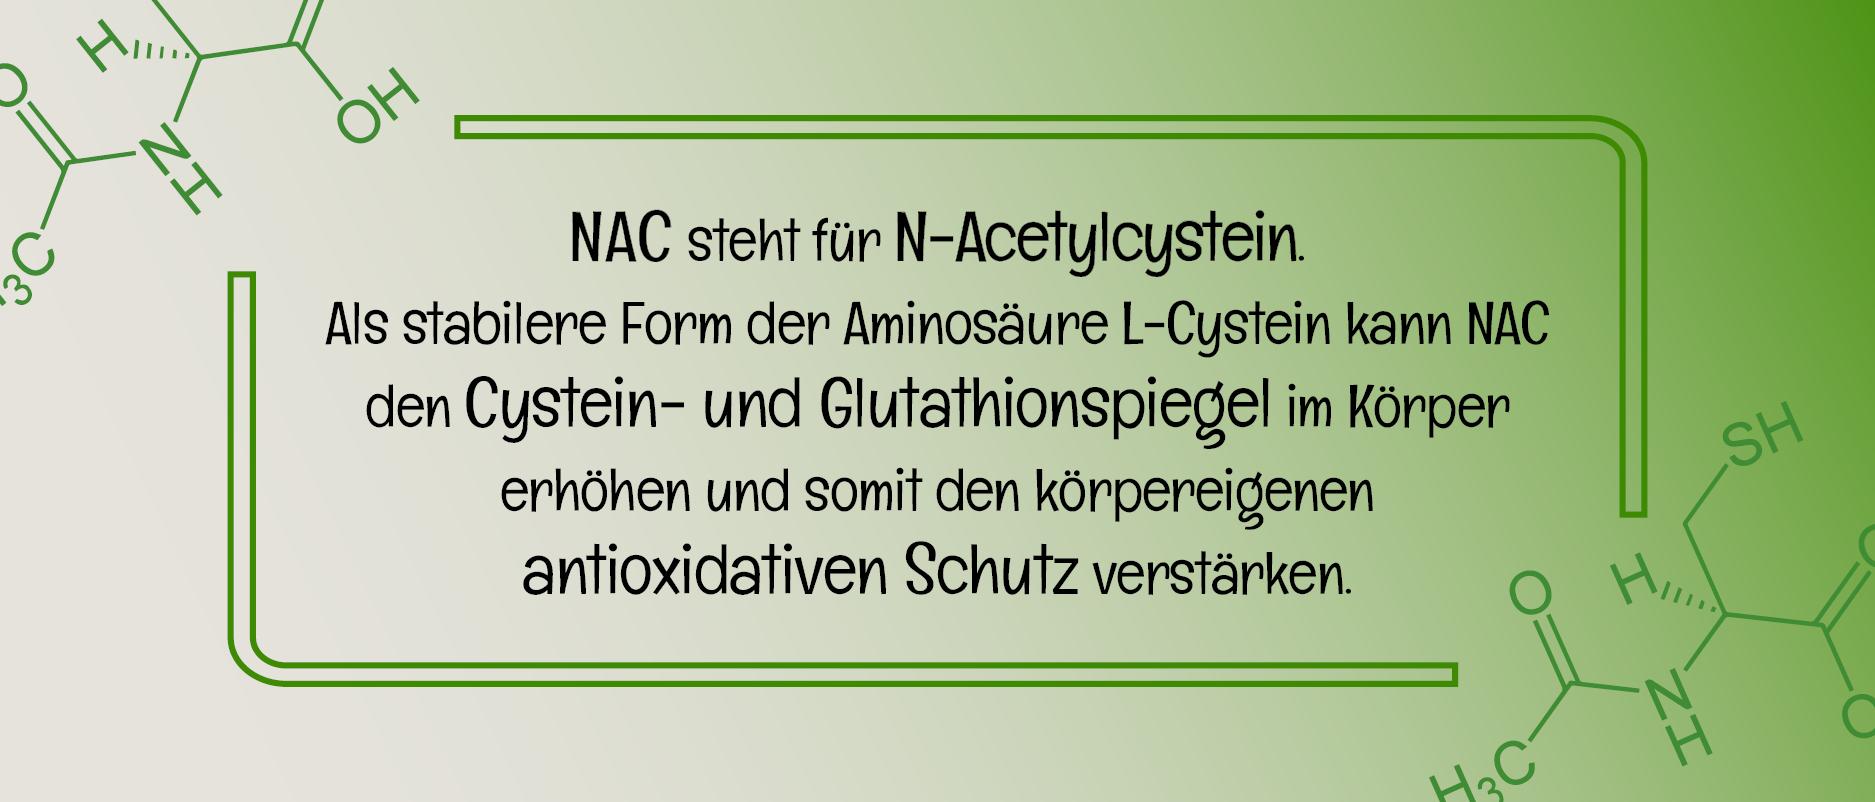 NAC Infographic